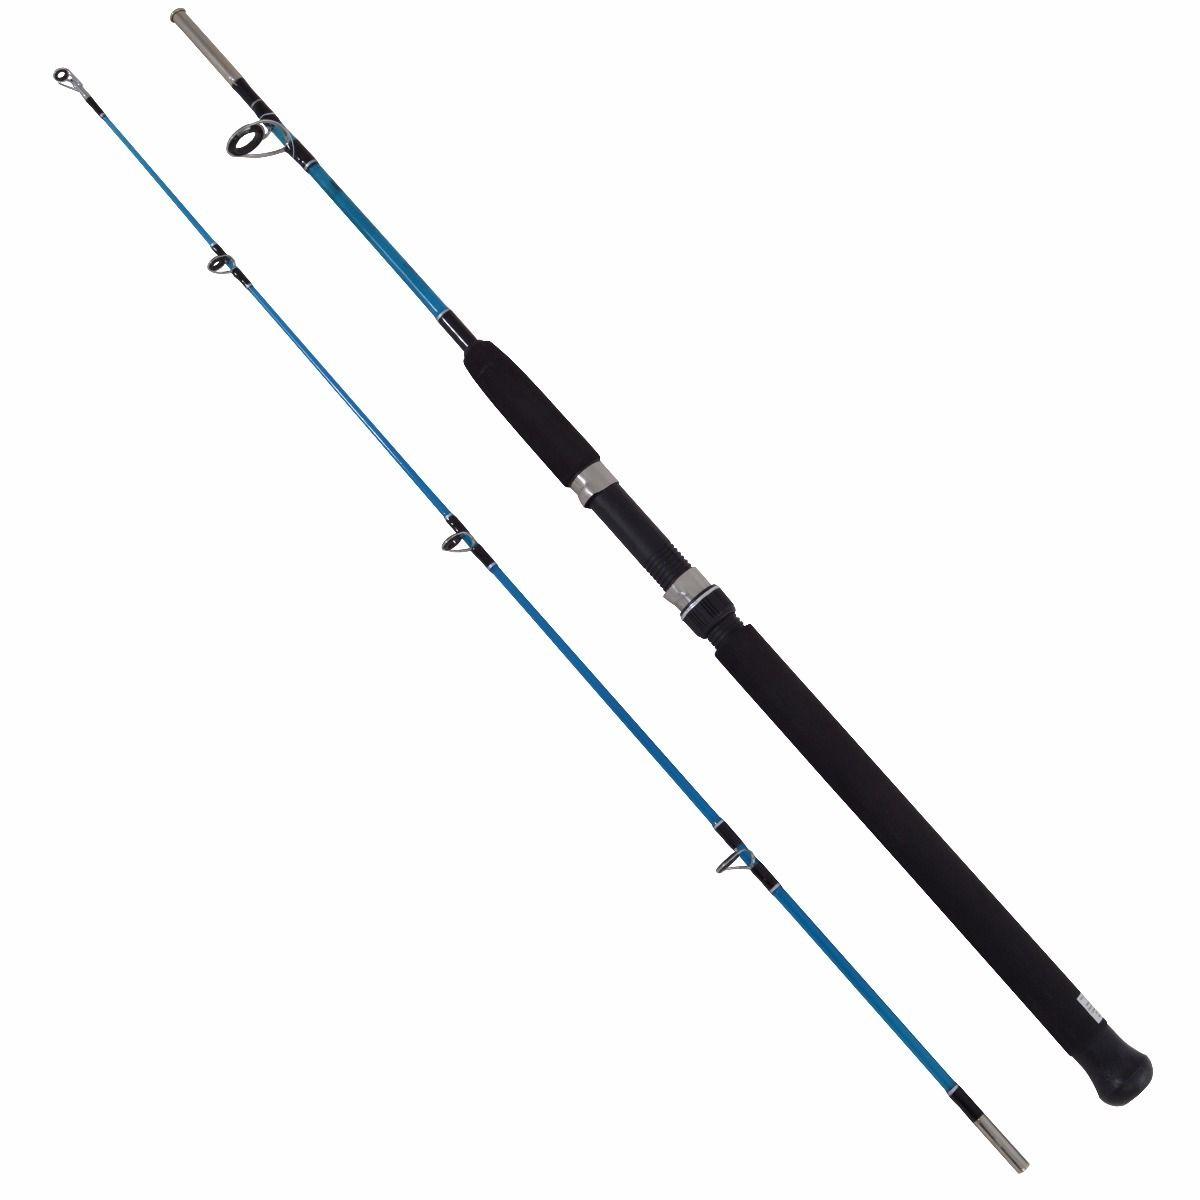 Vara de Pesca para Molinete Tambaqui 165 cm - Albatroz